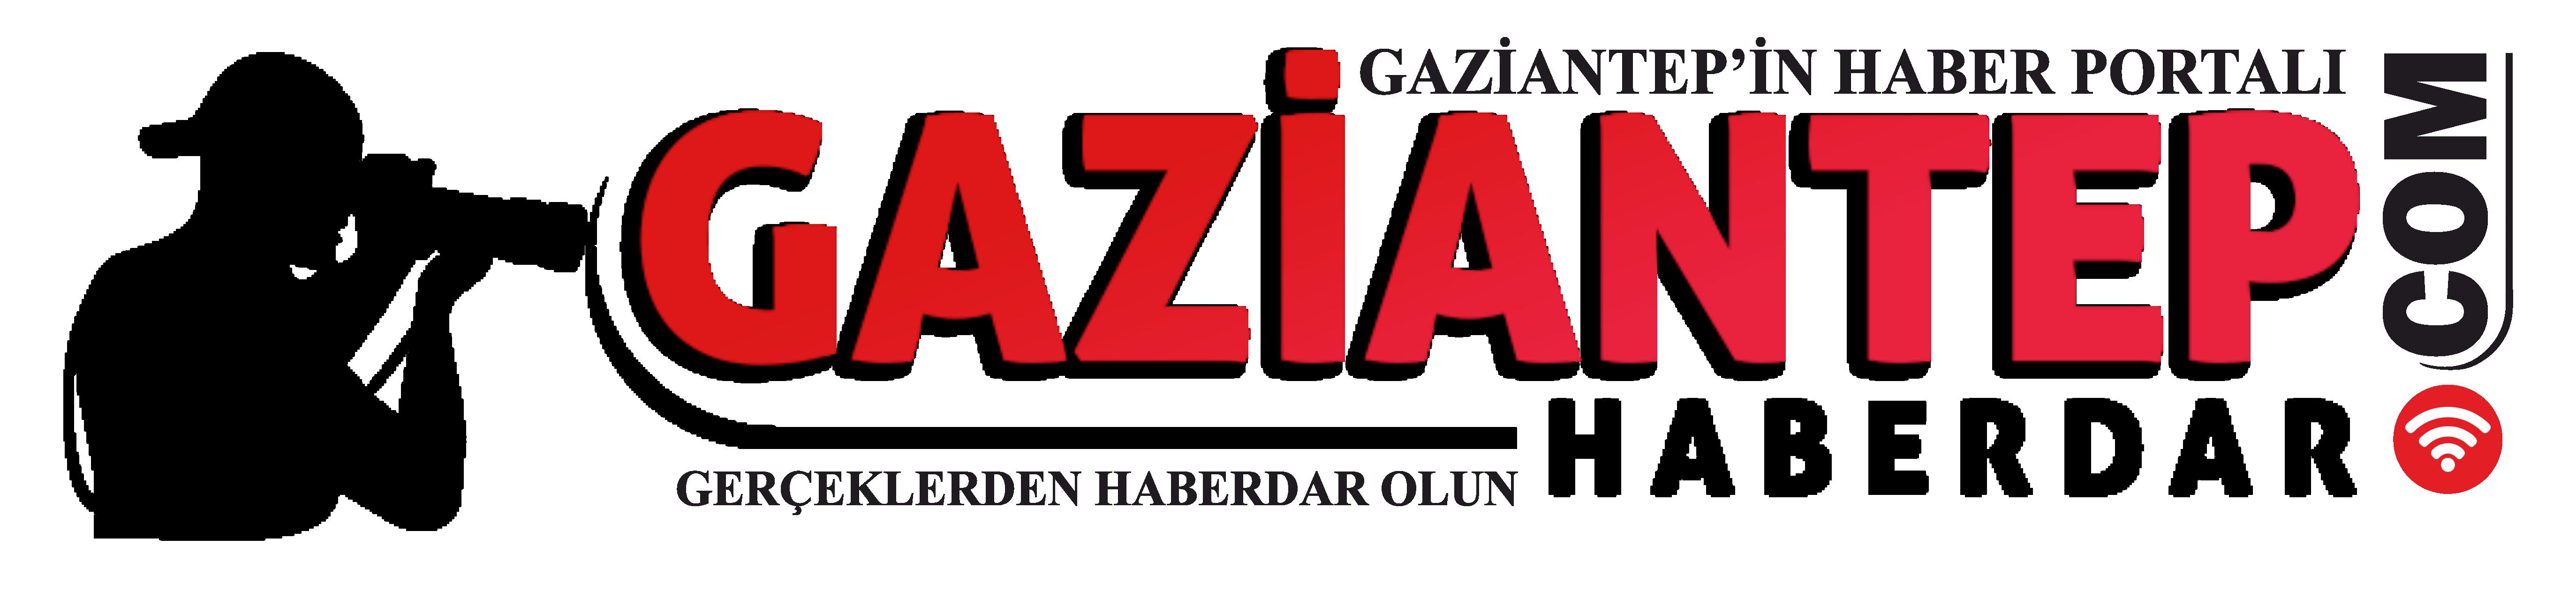 Gaziantep Haberdar